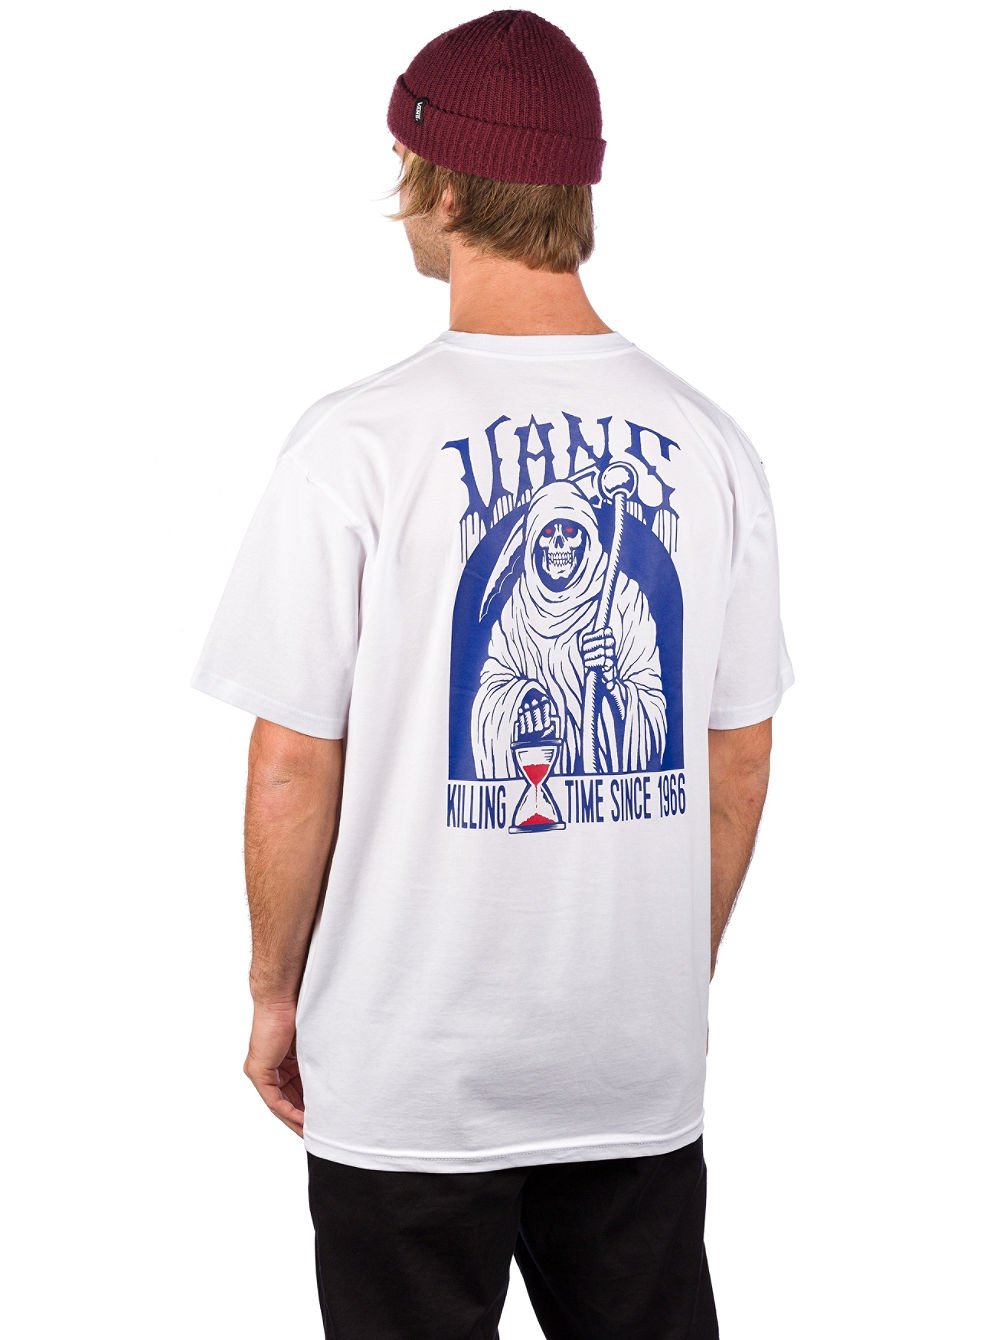 2e5d59fe95e Buy Vans Killing Time T-Shirt online at Blue Tomato